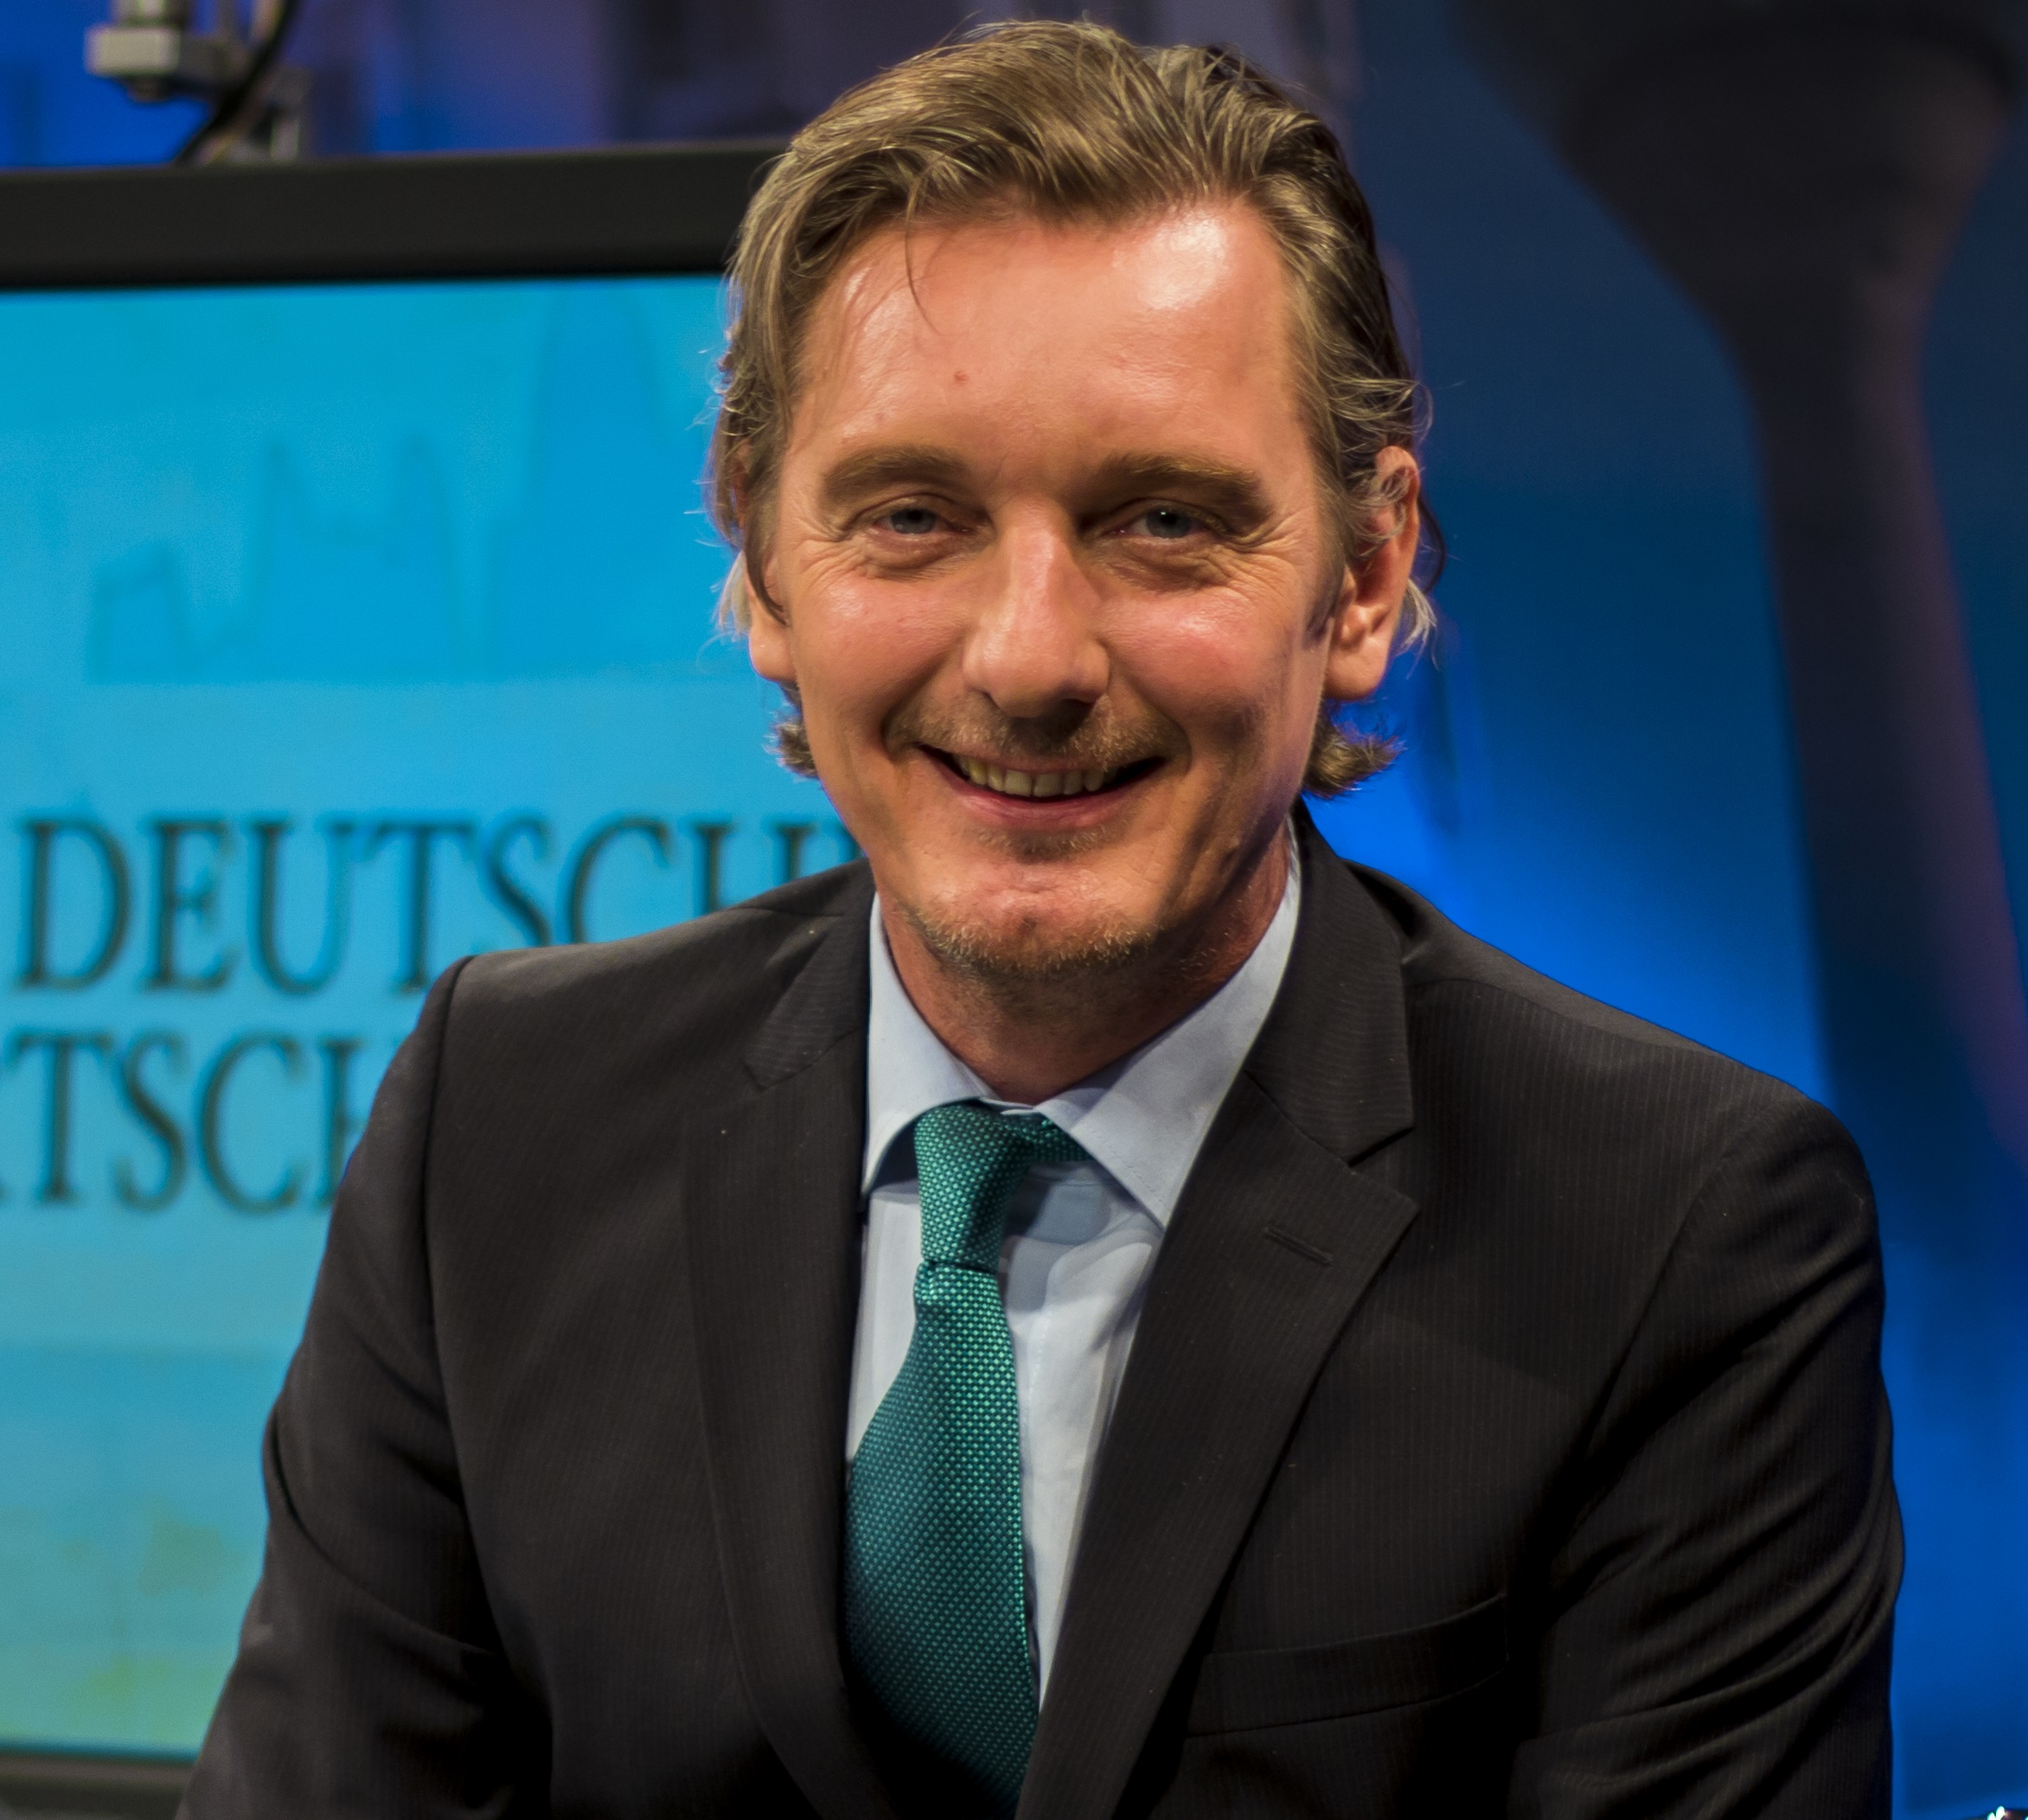 Michael Oelmann